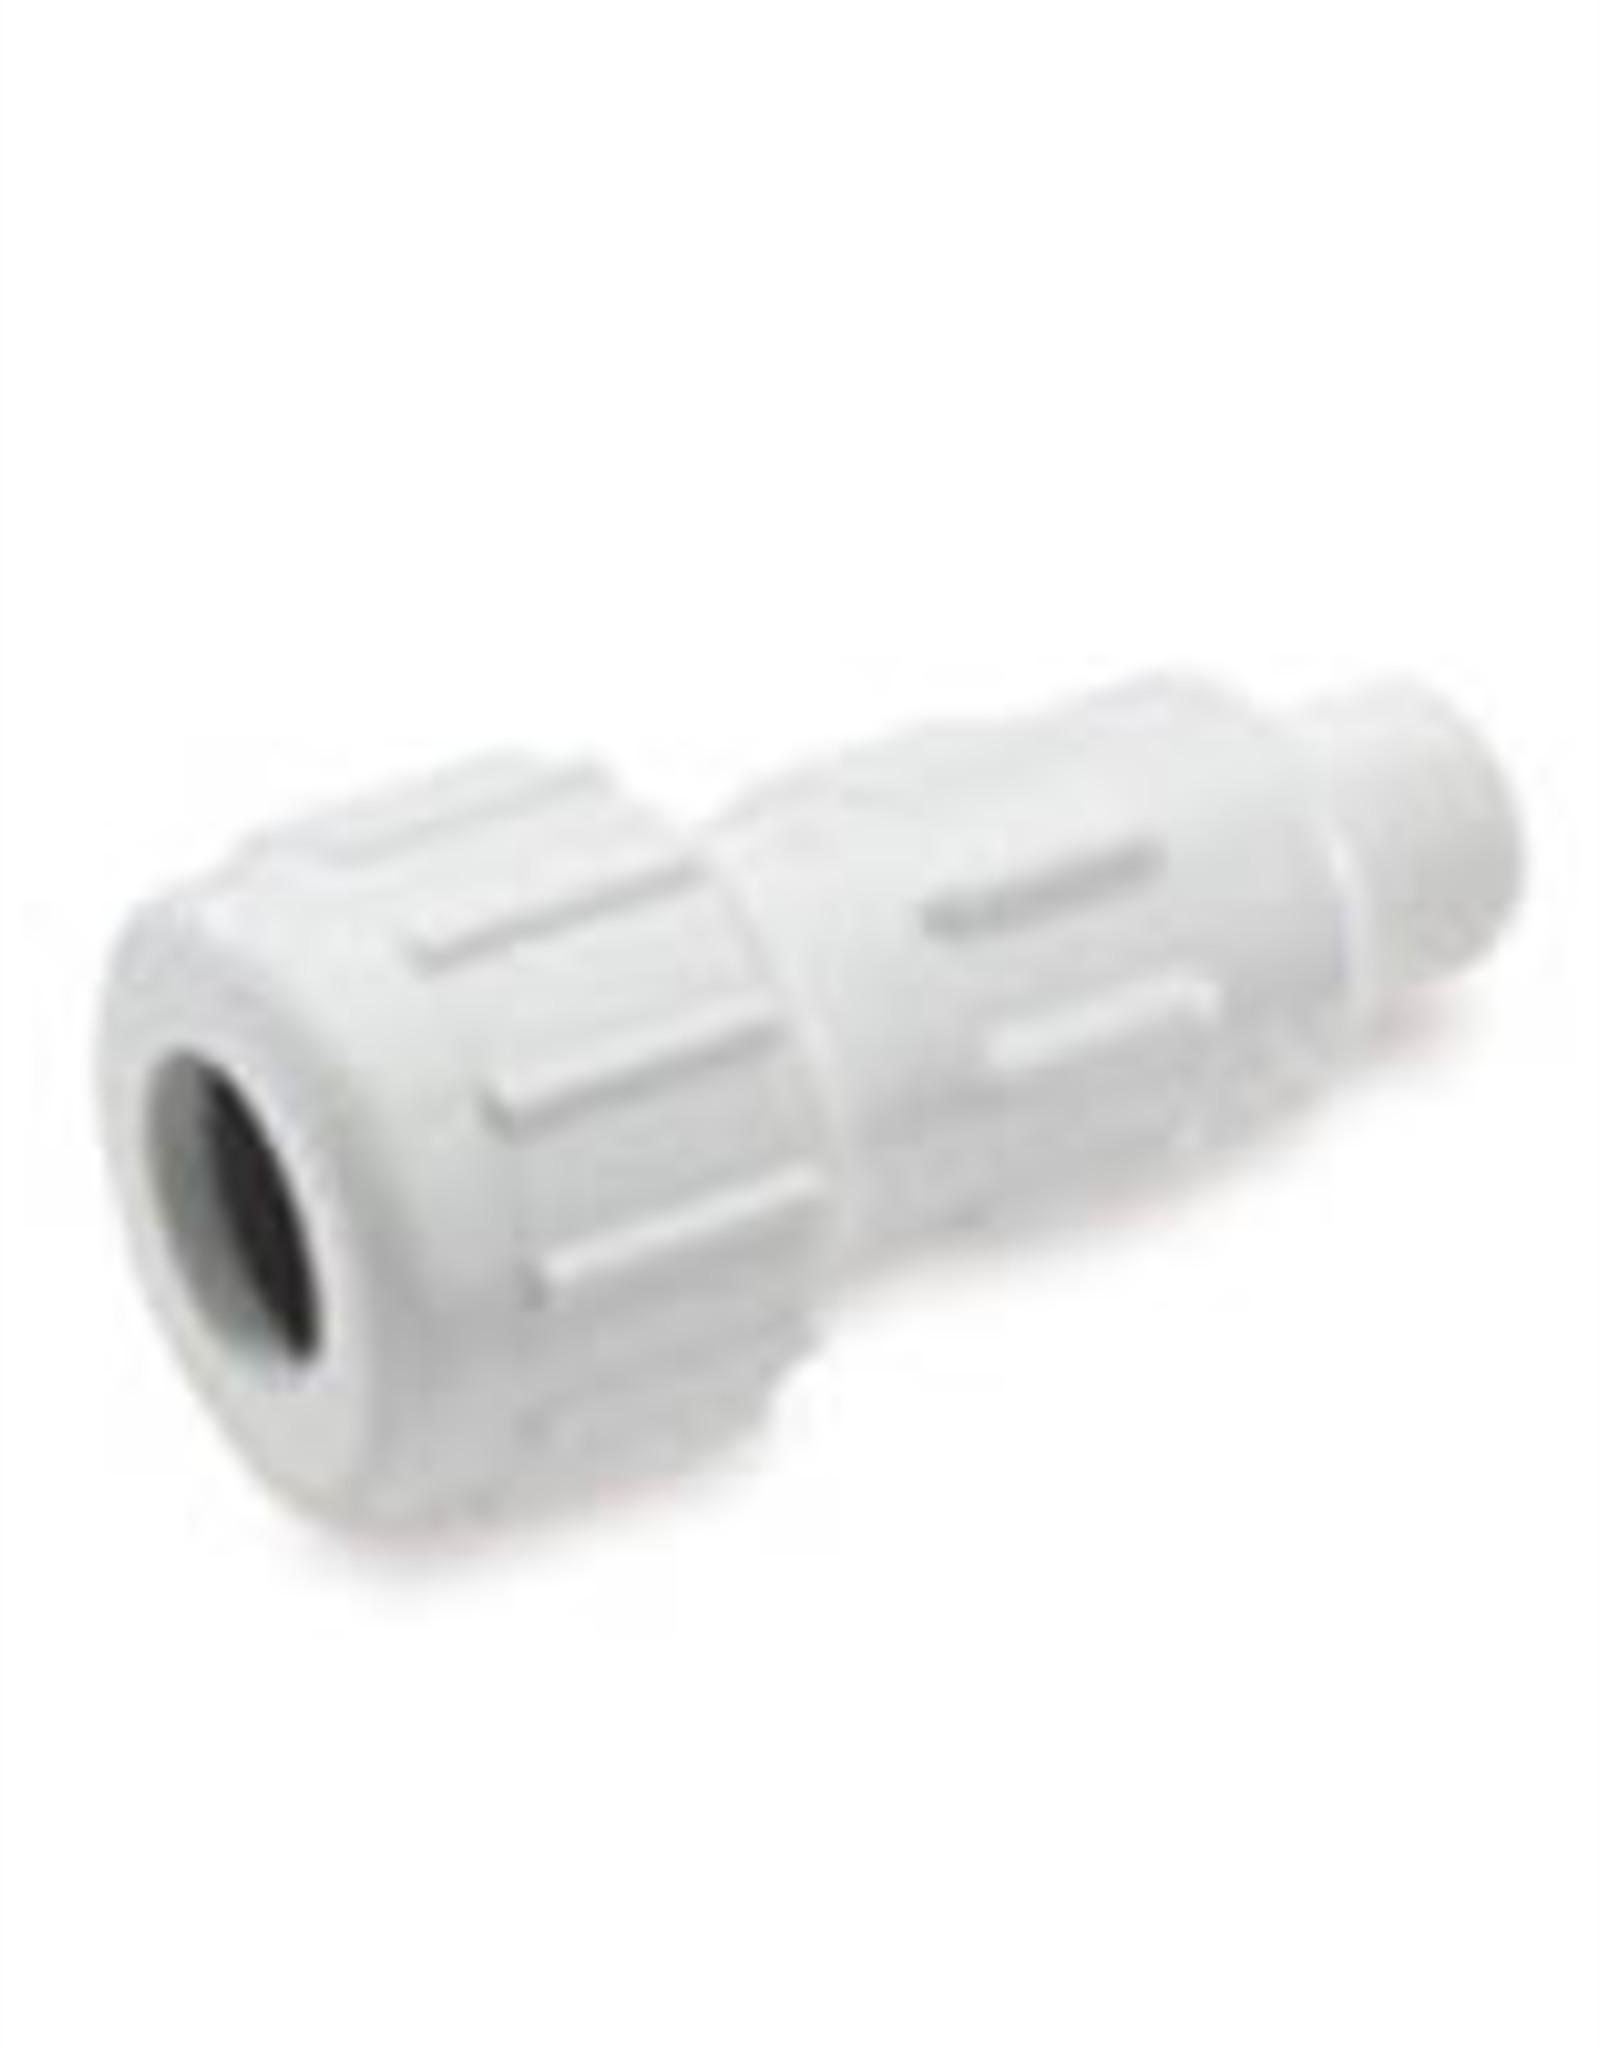 Nds PVC 3/4 Compression Repair Coupling (Compression x MIPT)